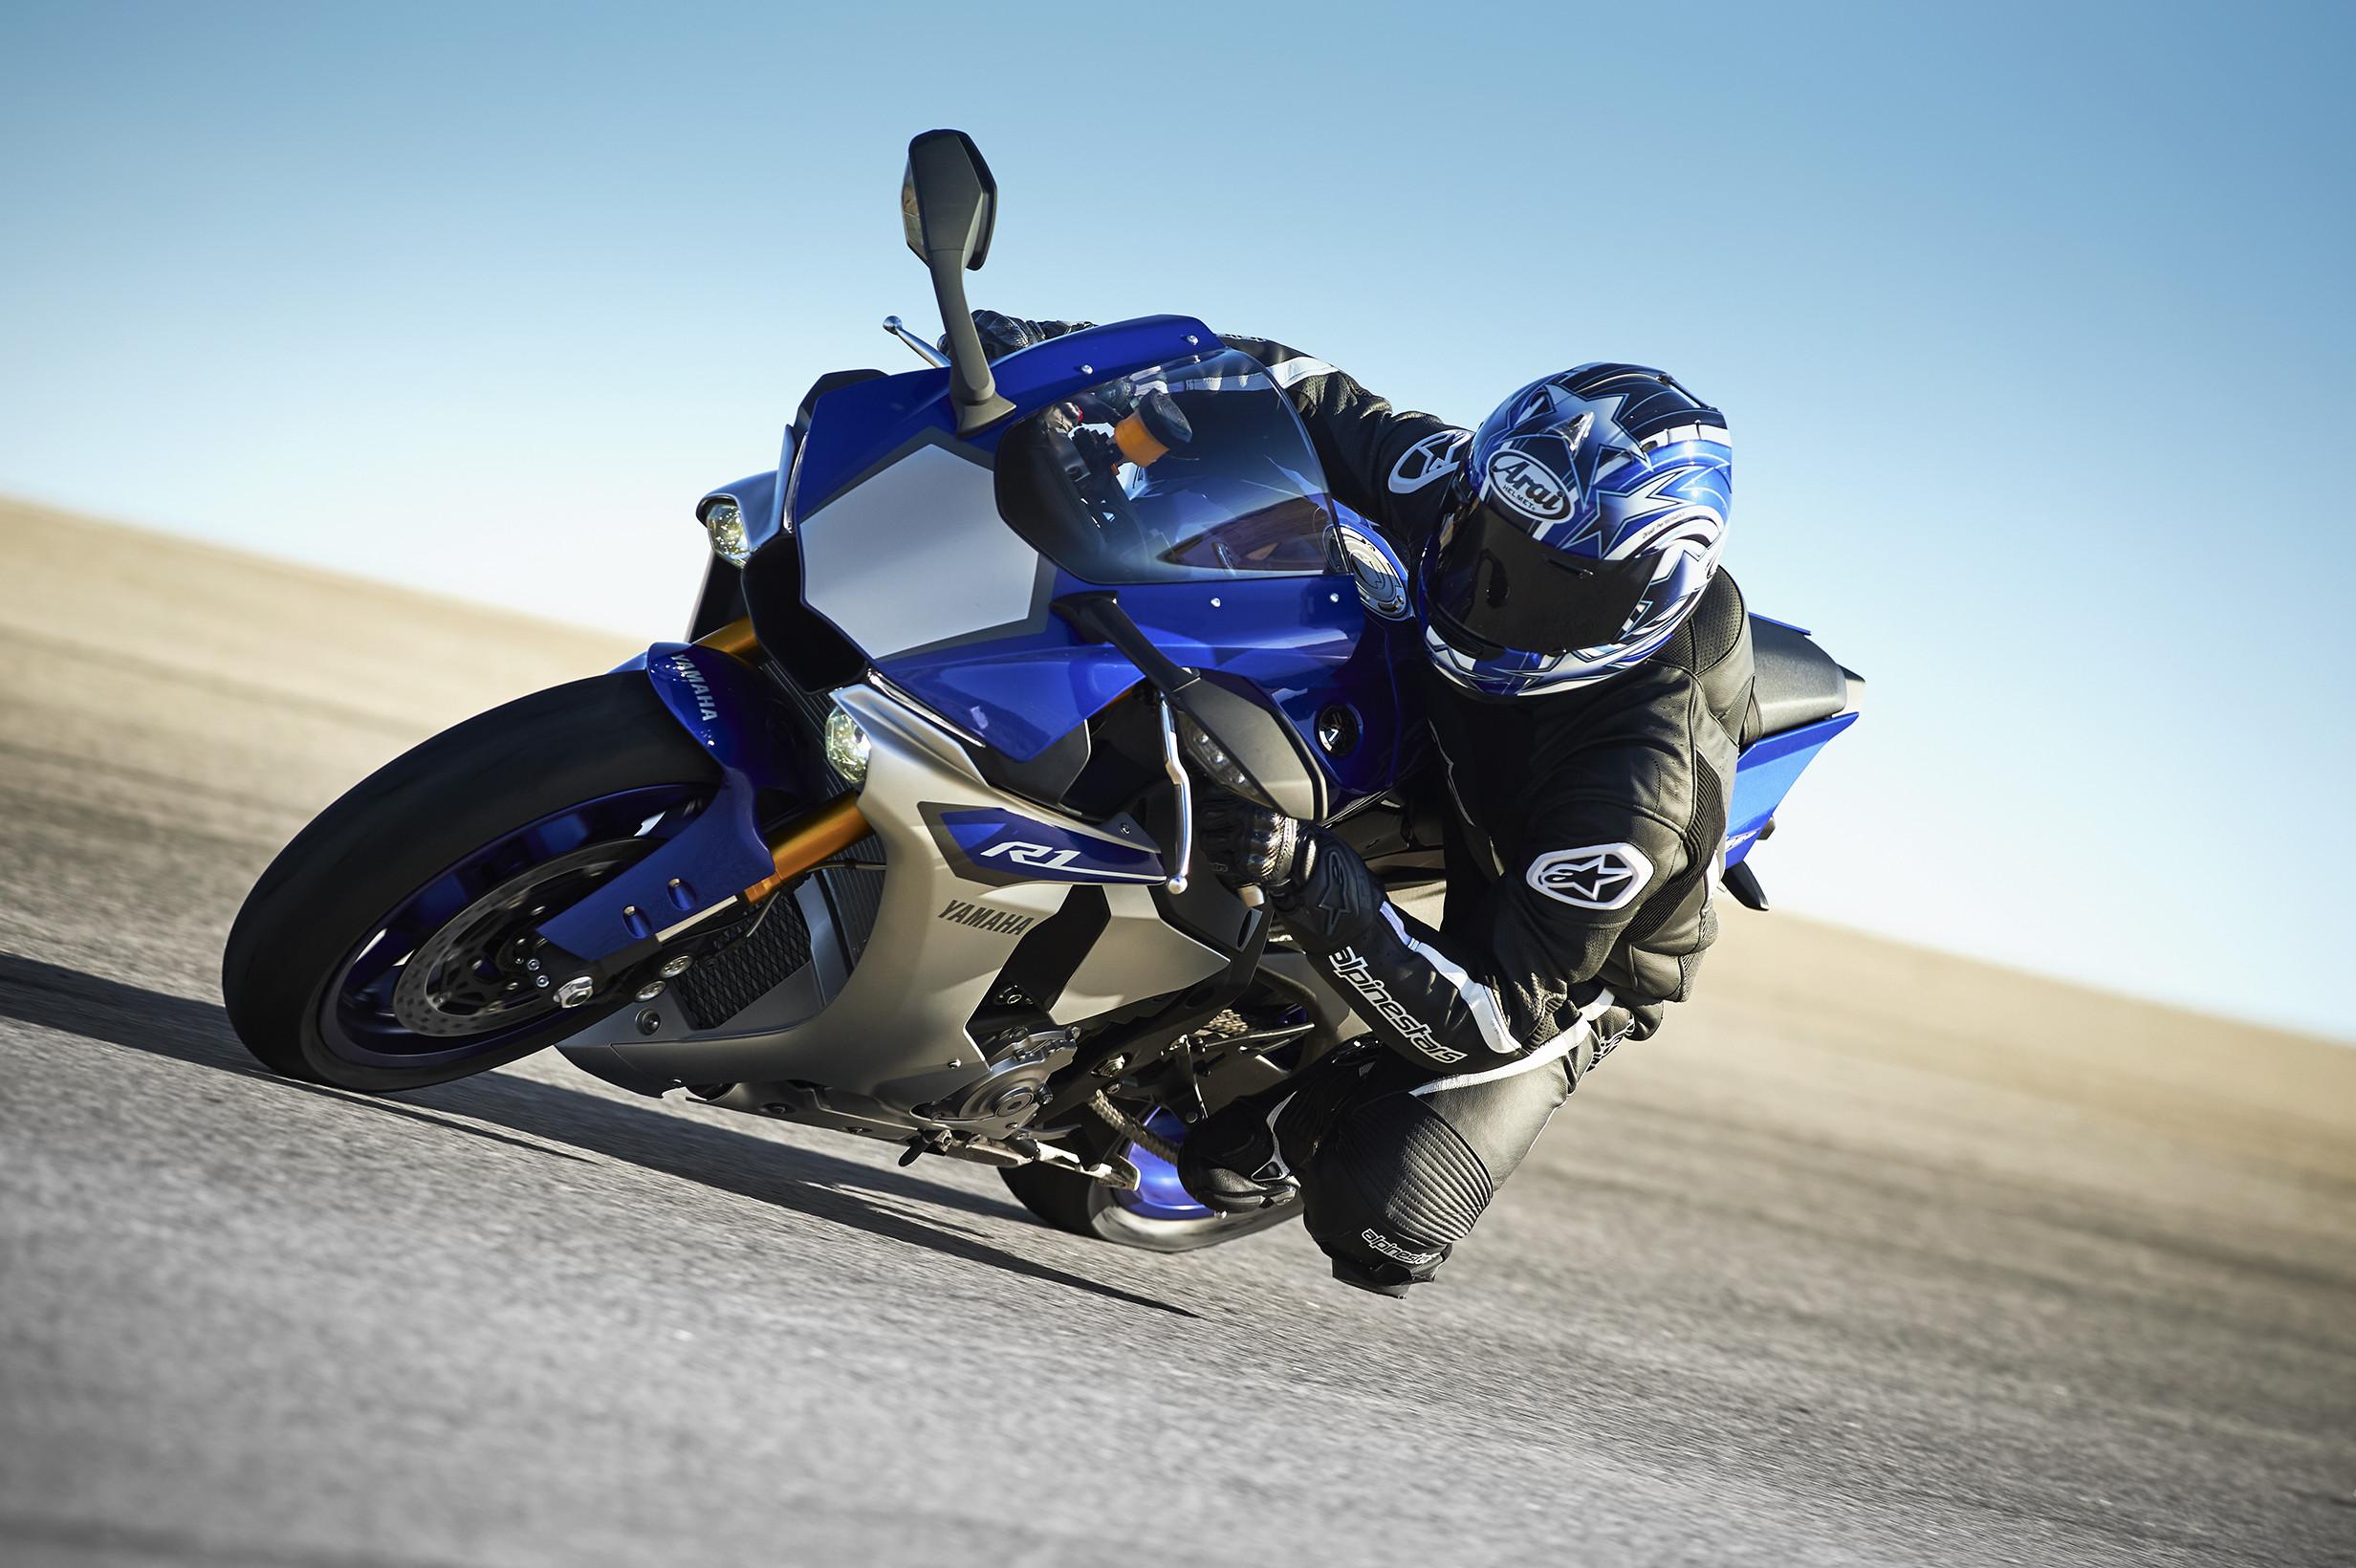 Res: 2464x1640, 2016 Yamaha YZF R1